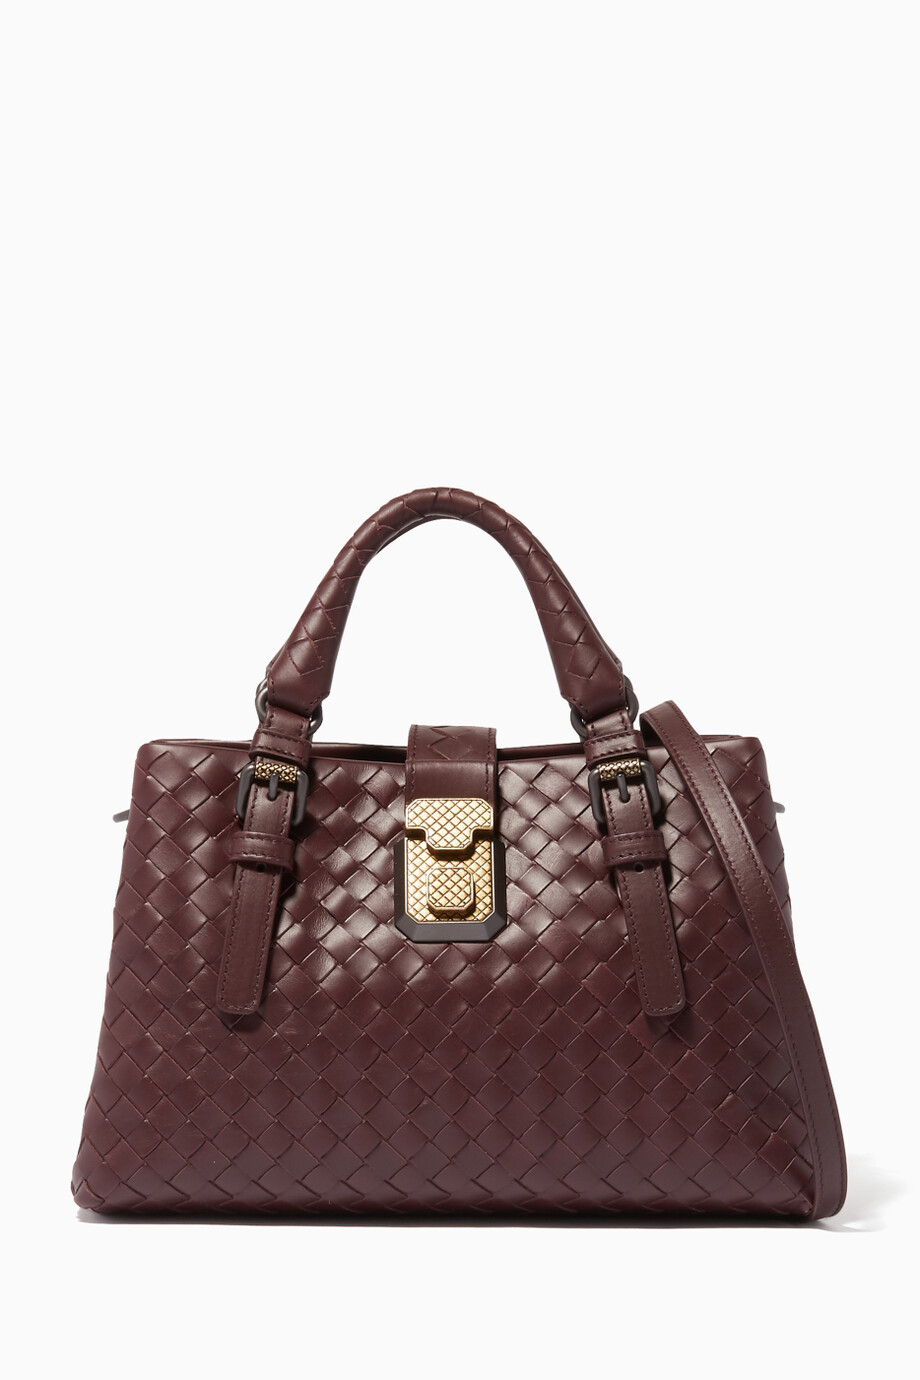 295b1b04a2 Shop Bottega Veneta Red Burungdy Mini Roma Intrecciato Leather Tote ...